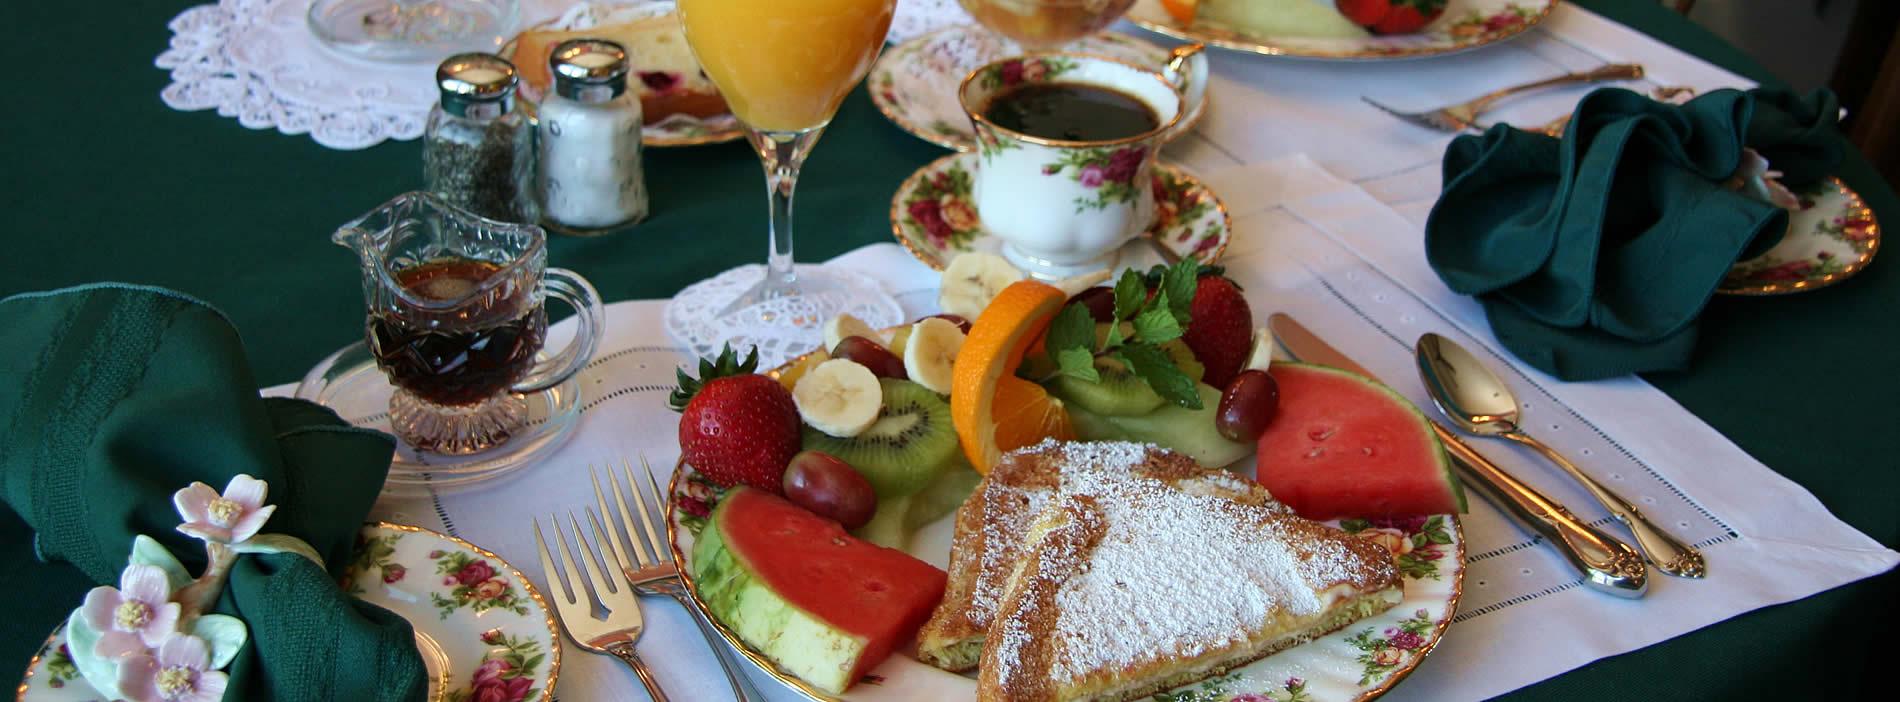 Sutter Creek Bed And Breakfast Inns